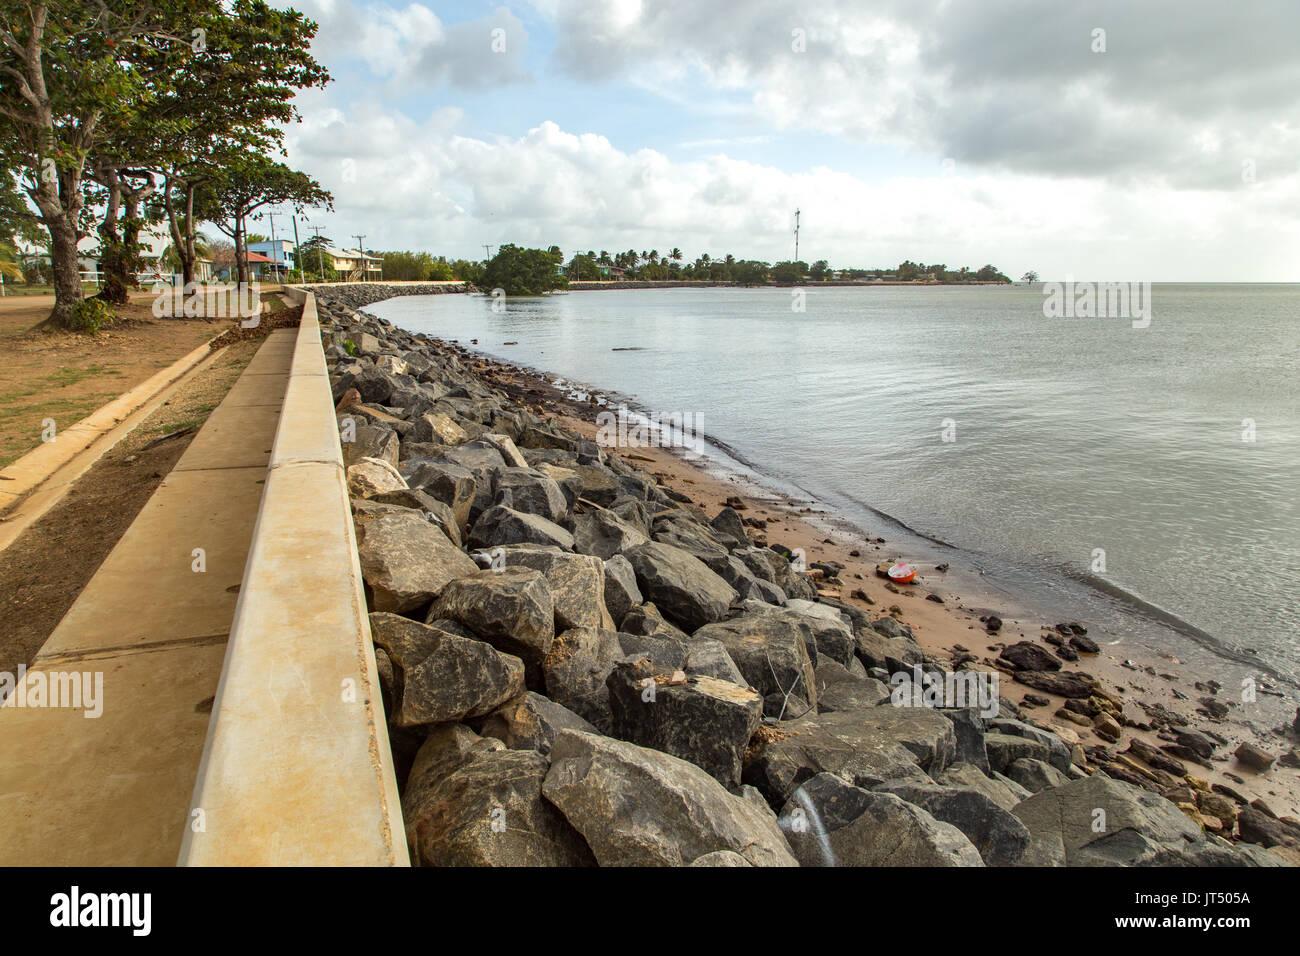 Saibai Island: Saibai Stock Photos & Saibai Stock Images